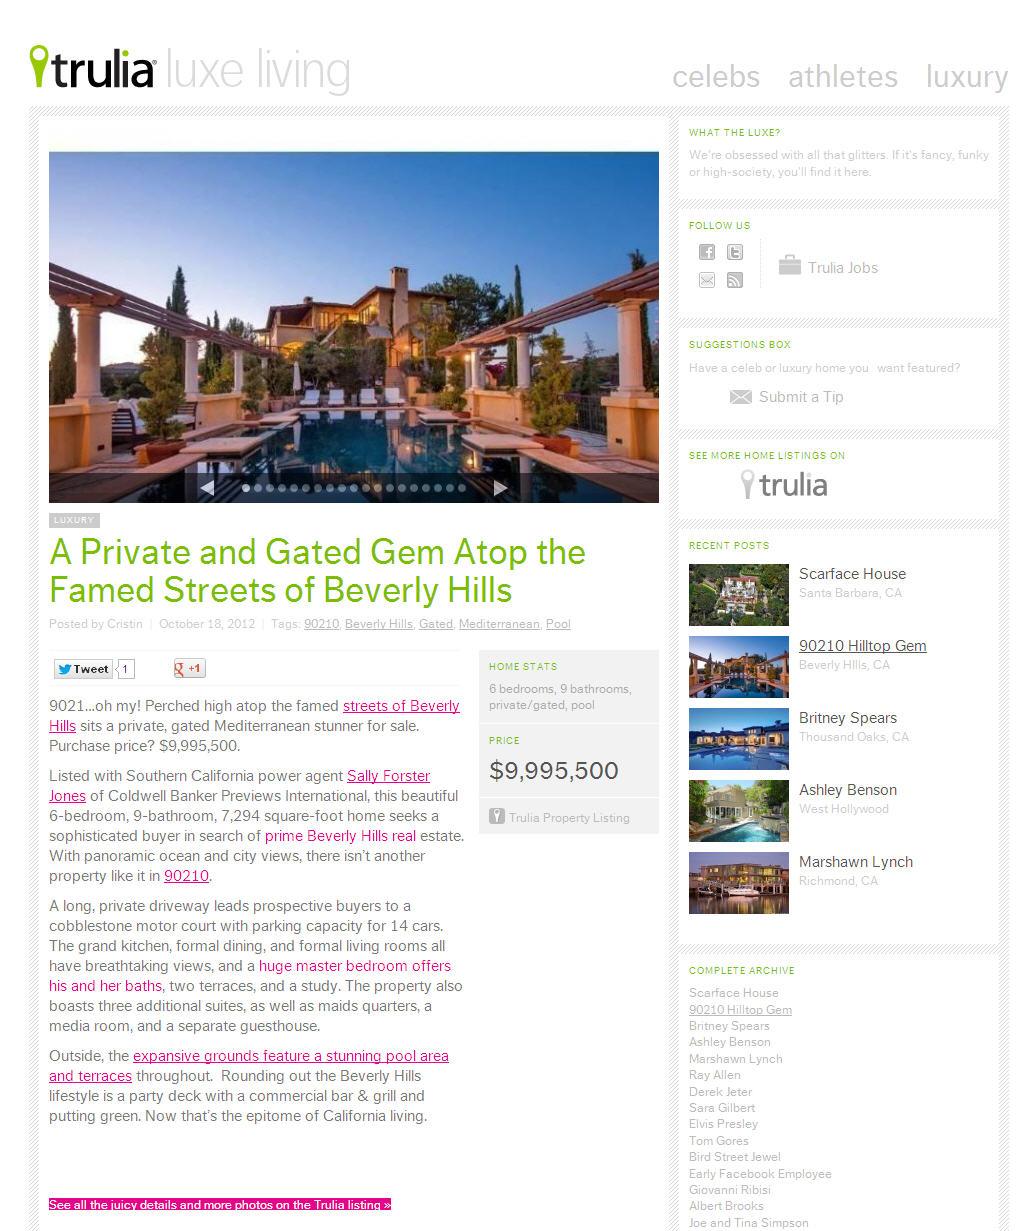 Trulia Real Estate Listings Homes For Sale Housing Data: Trulia.com Blog Features 2300 Kimridge Road!